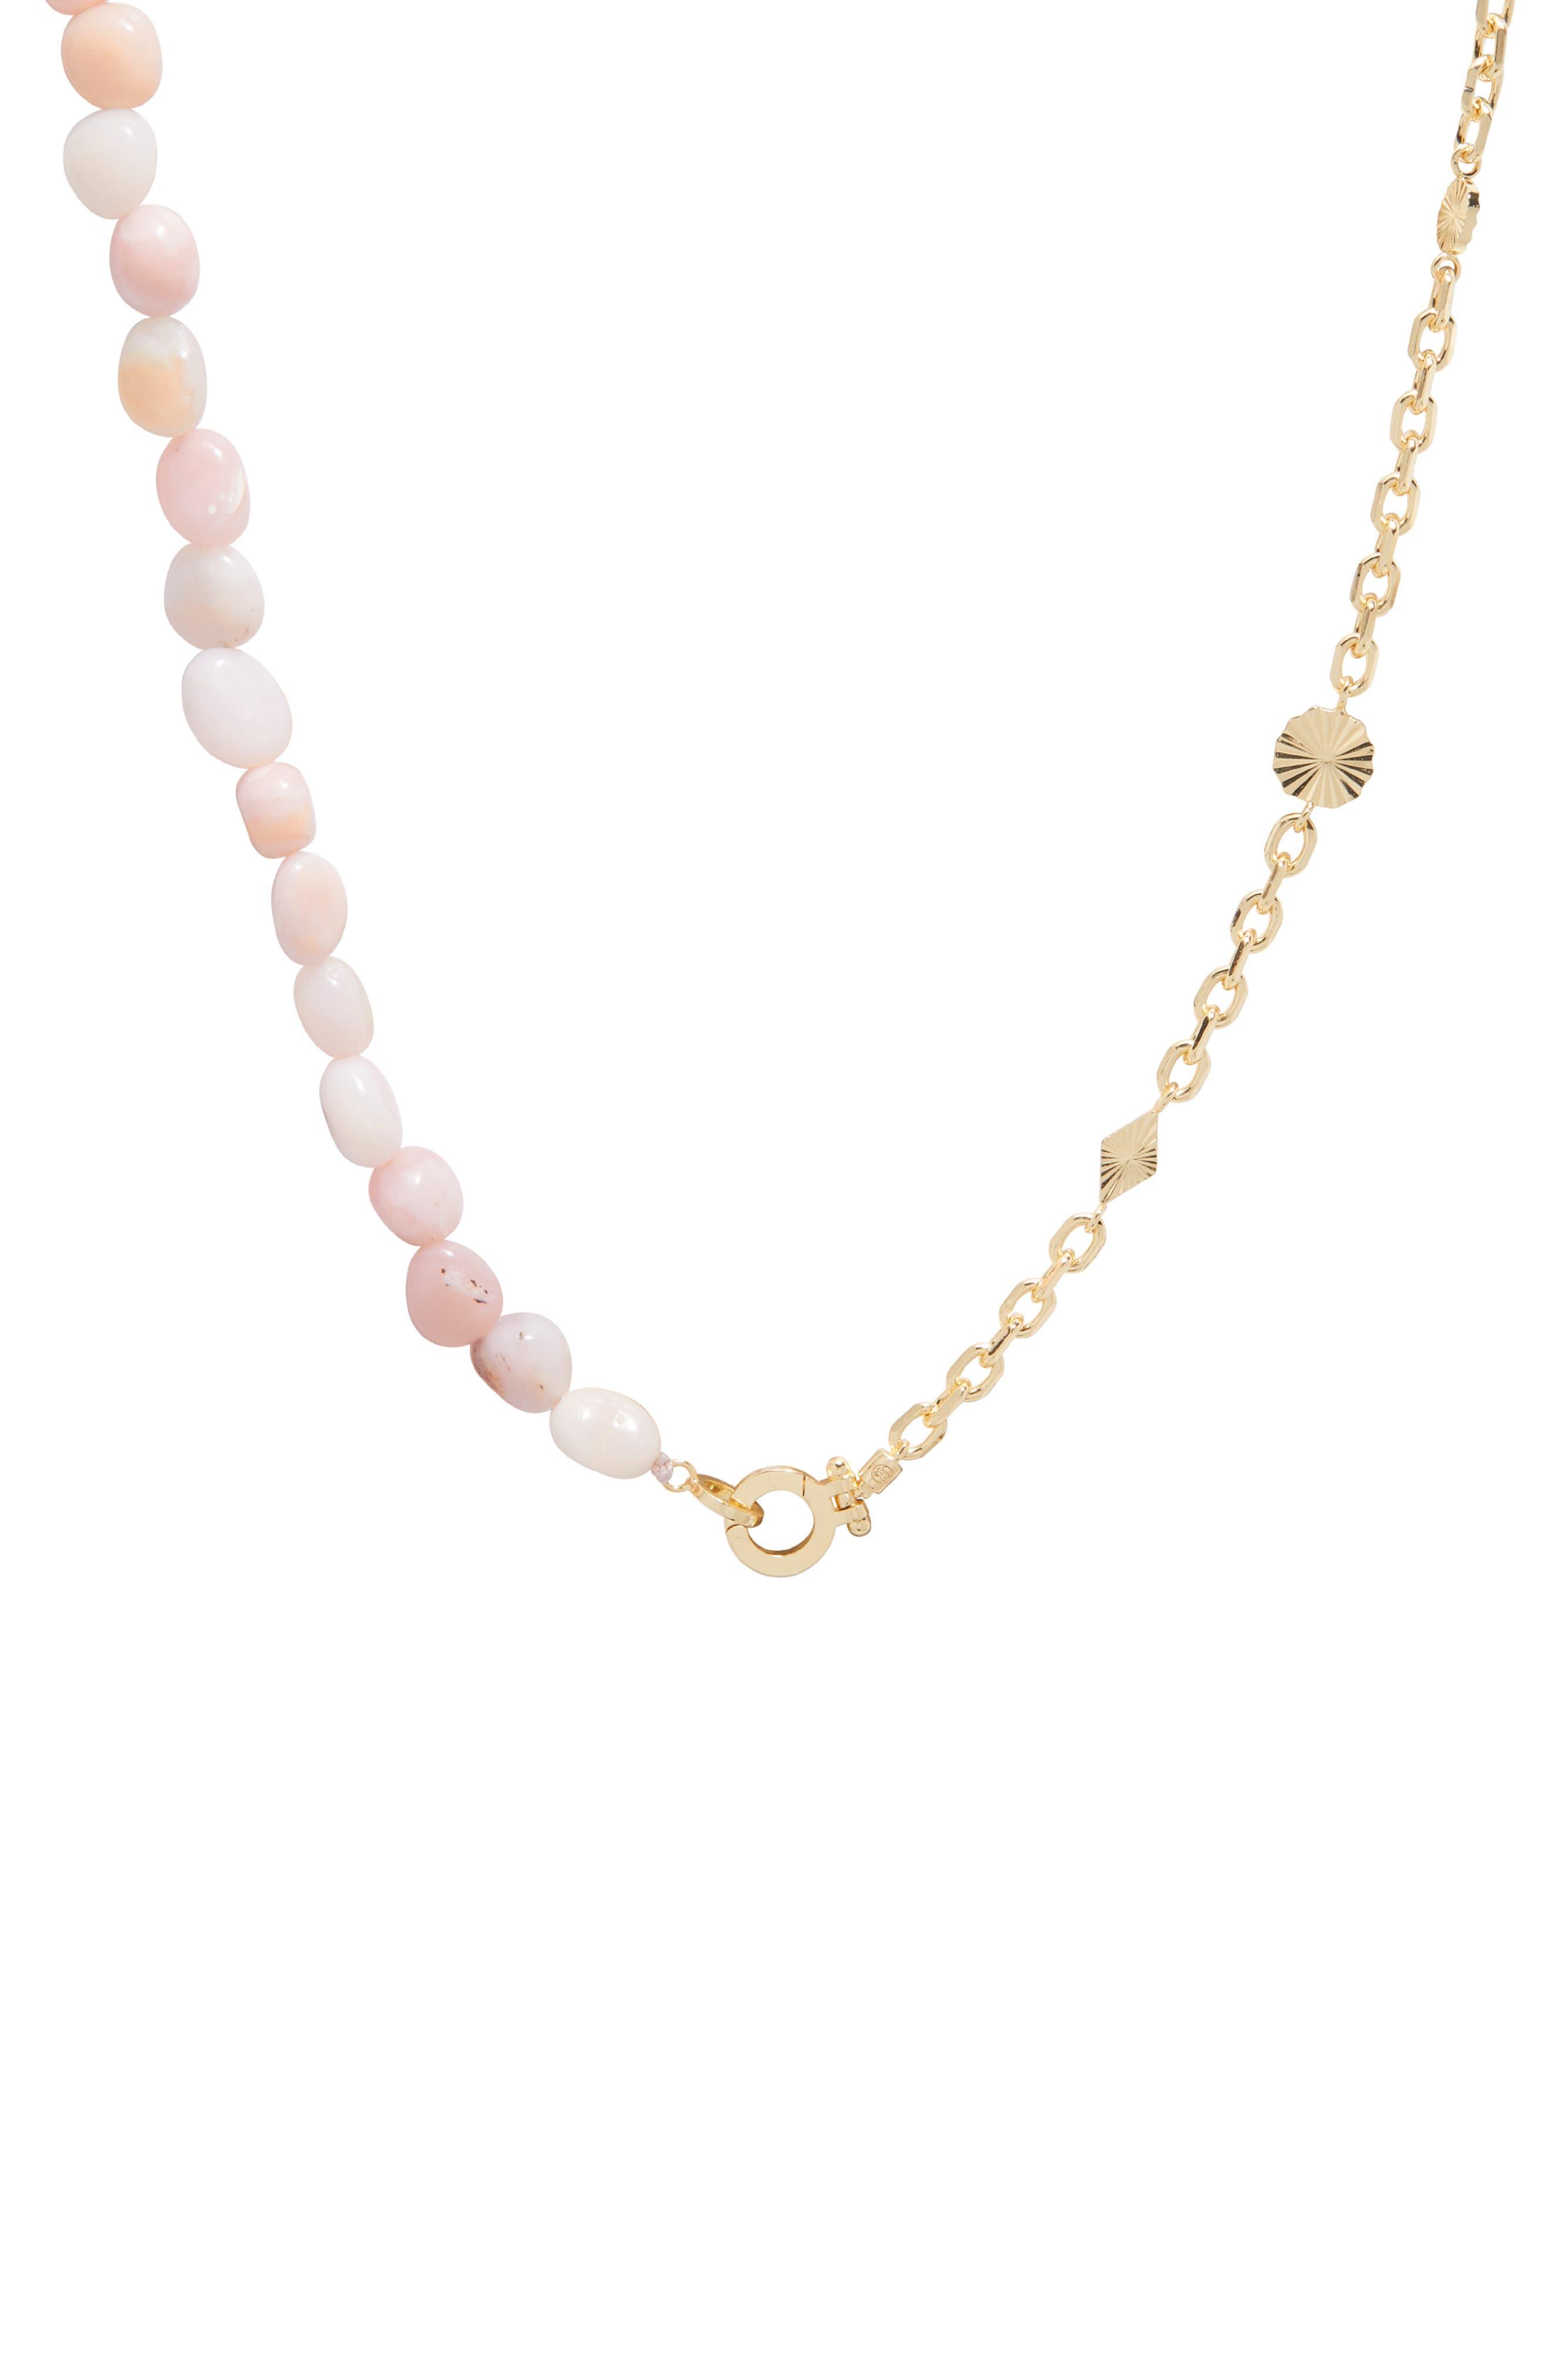 Alice Gem Charm Necklace